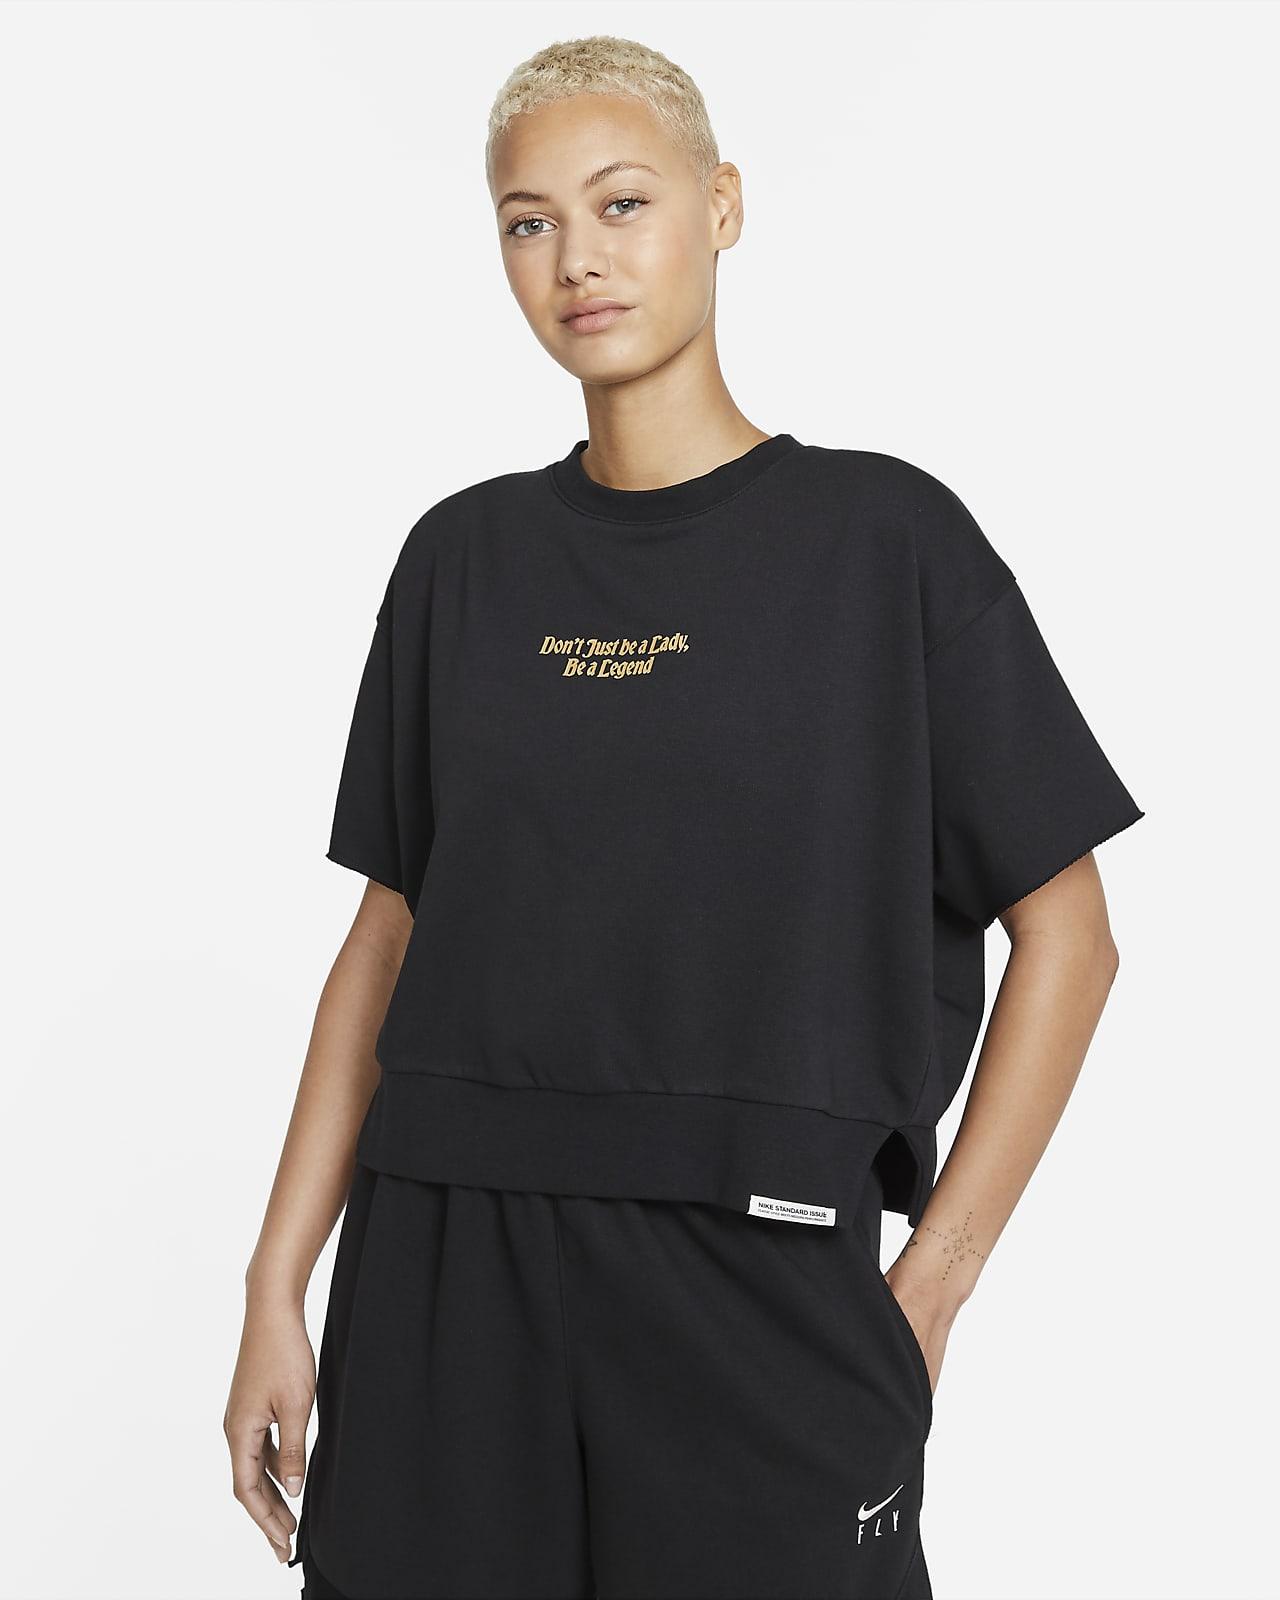 Damska koszulka do koszykówki Nike Dri-FIT Standard Issue